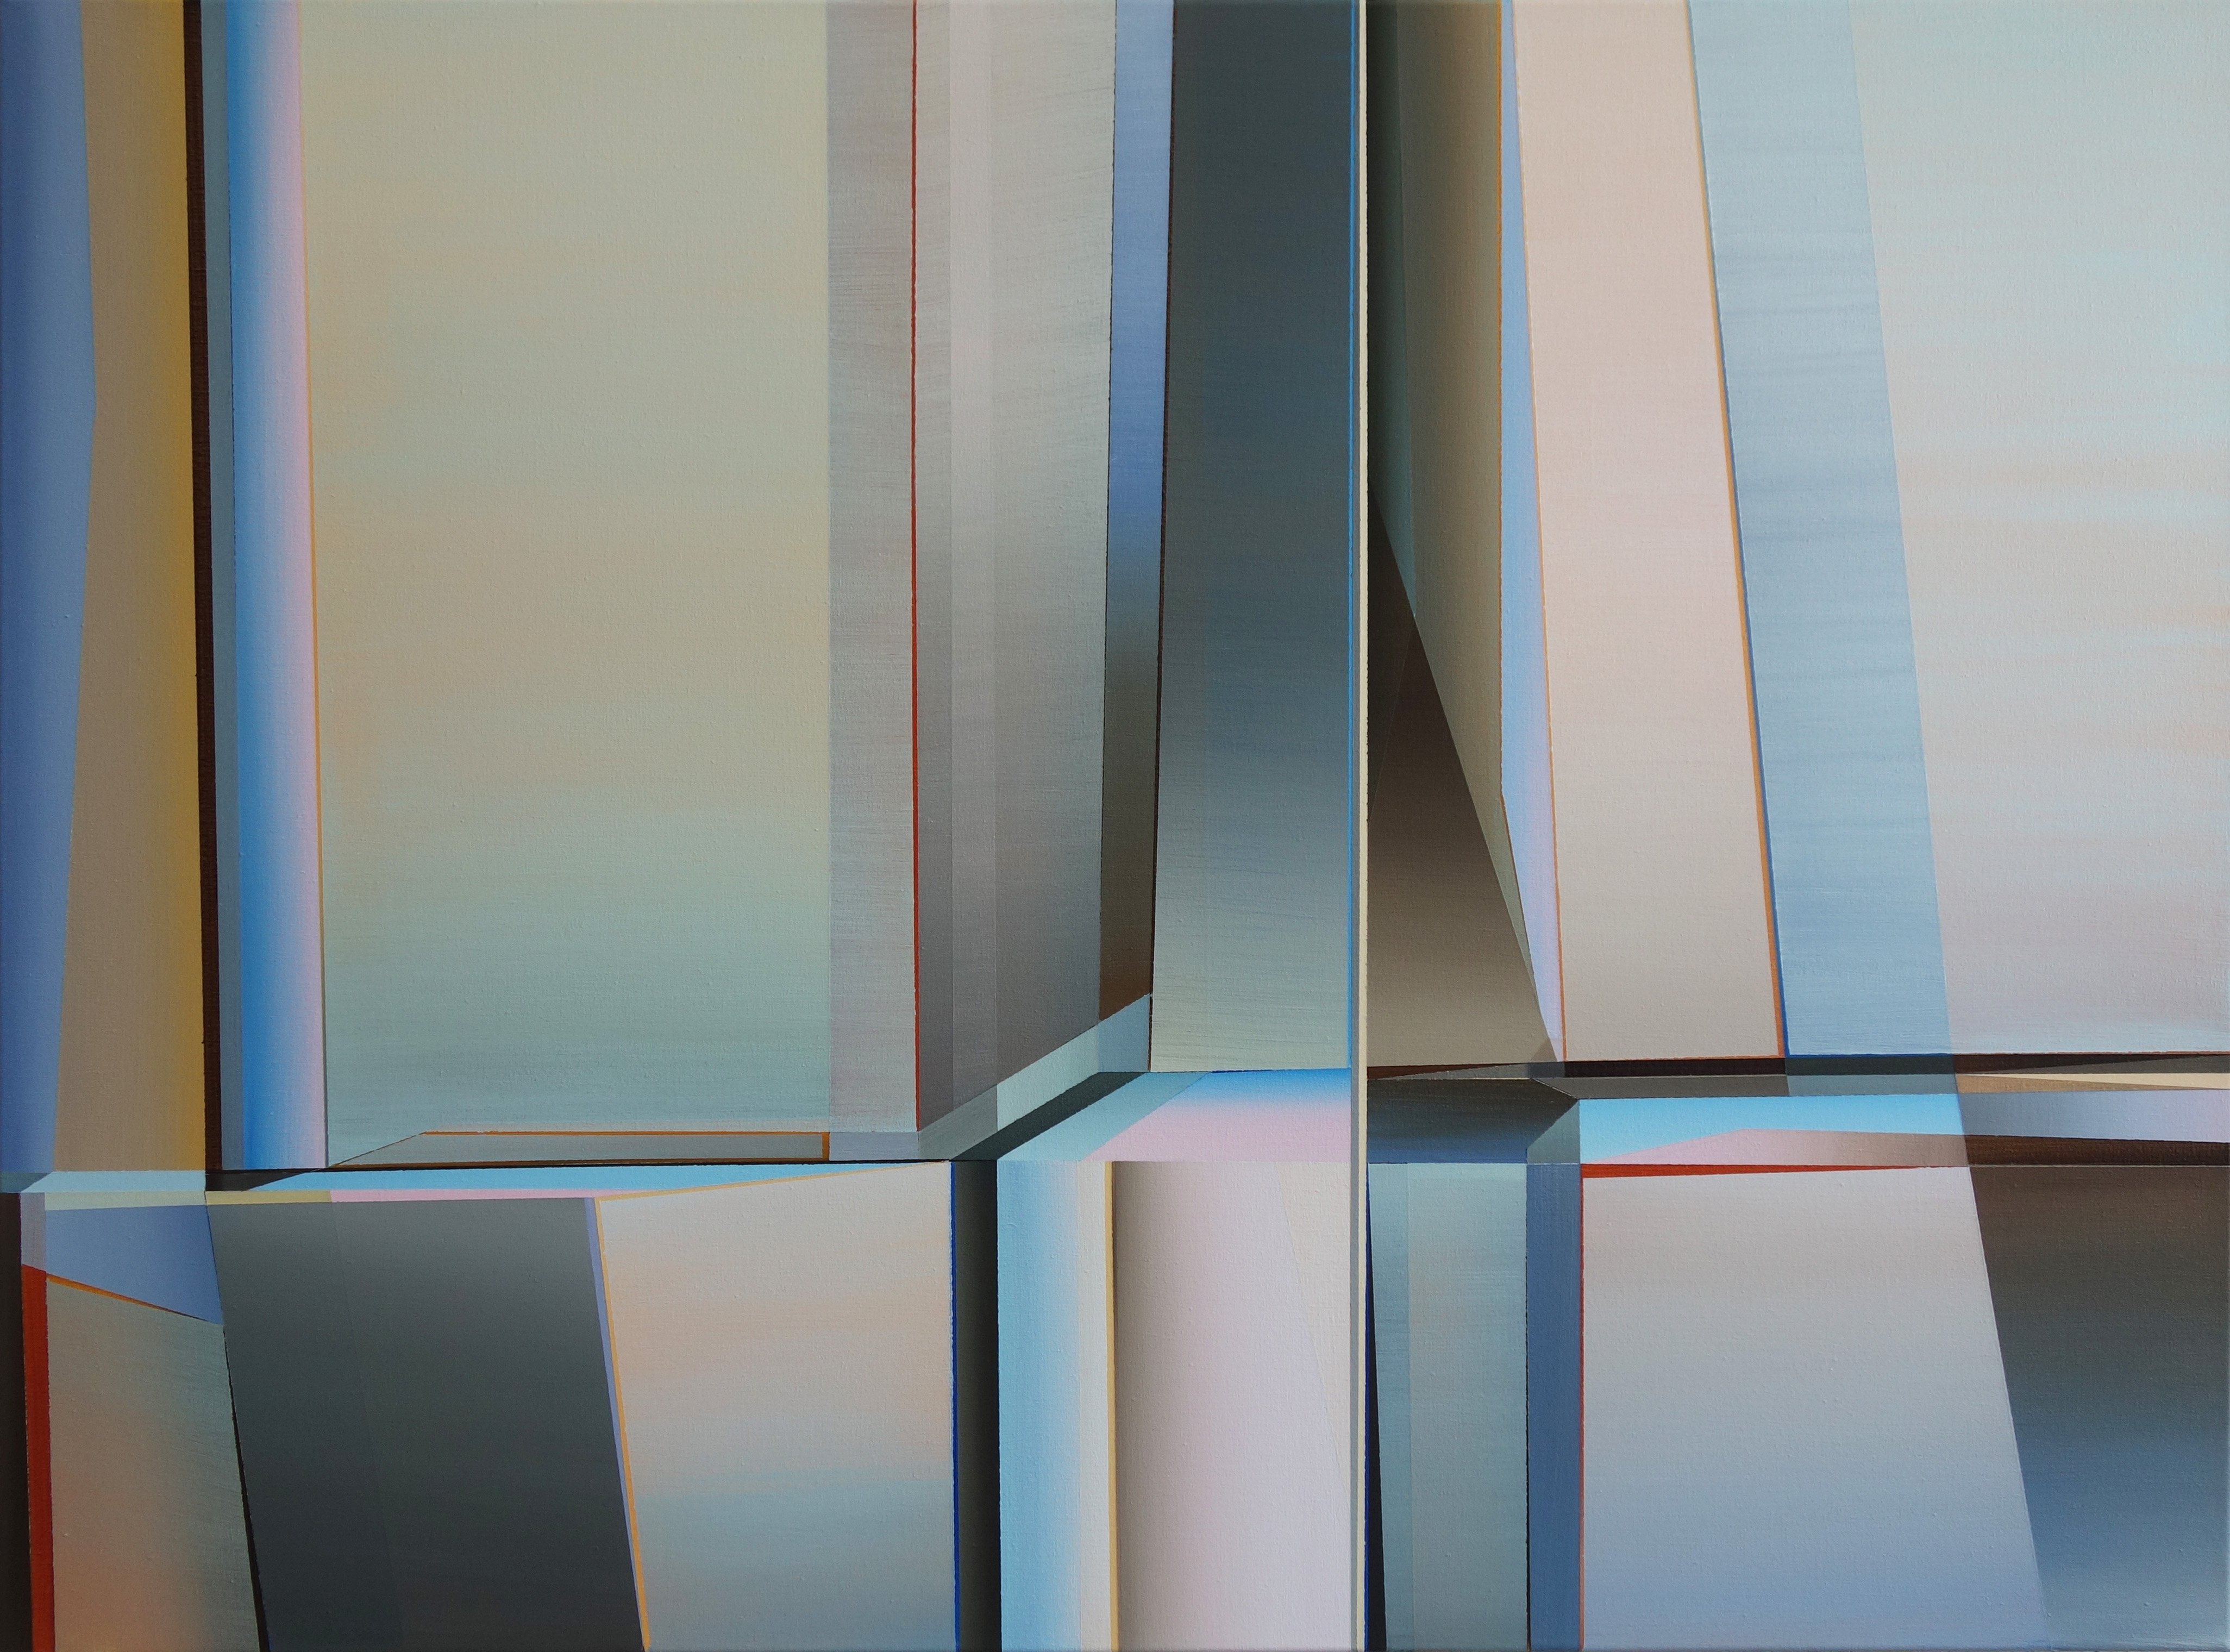 Marten Kirbach, Klar auf klar, 75x100 cm, 2019, Acryl auf Leinwand